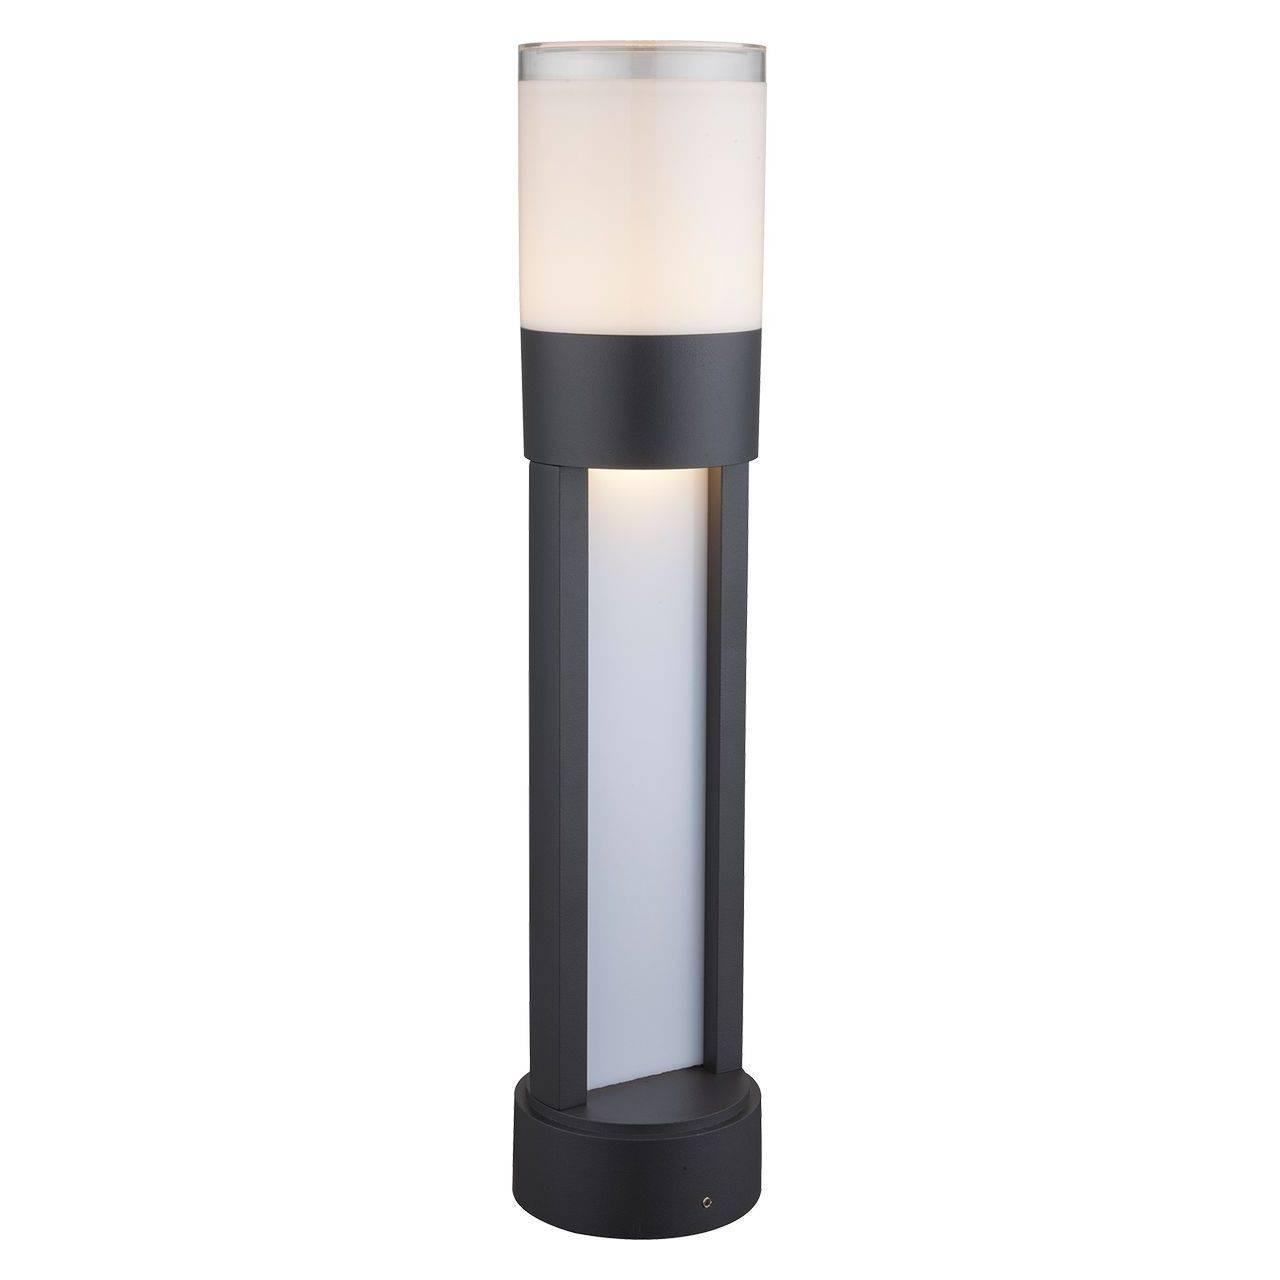 Уличный светодиодный светильник Globo Nexa 34012 уличный настенный светодиодный светильник globo nexa 34011